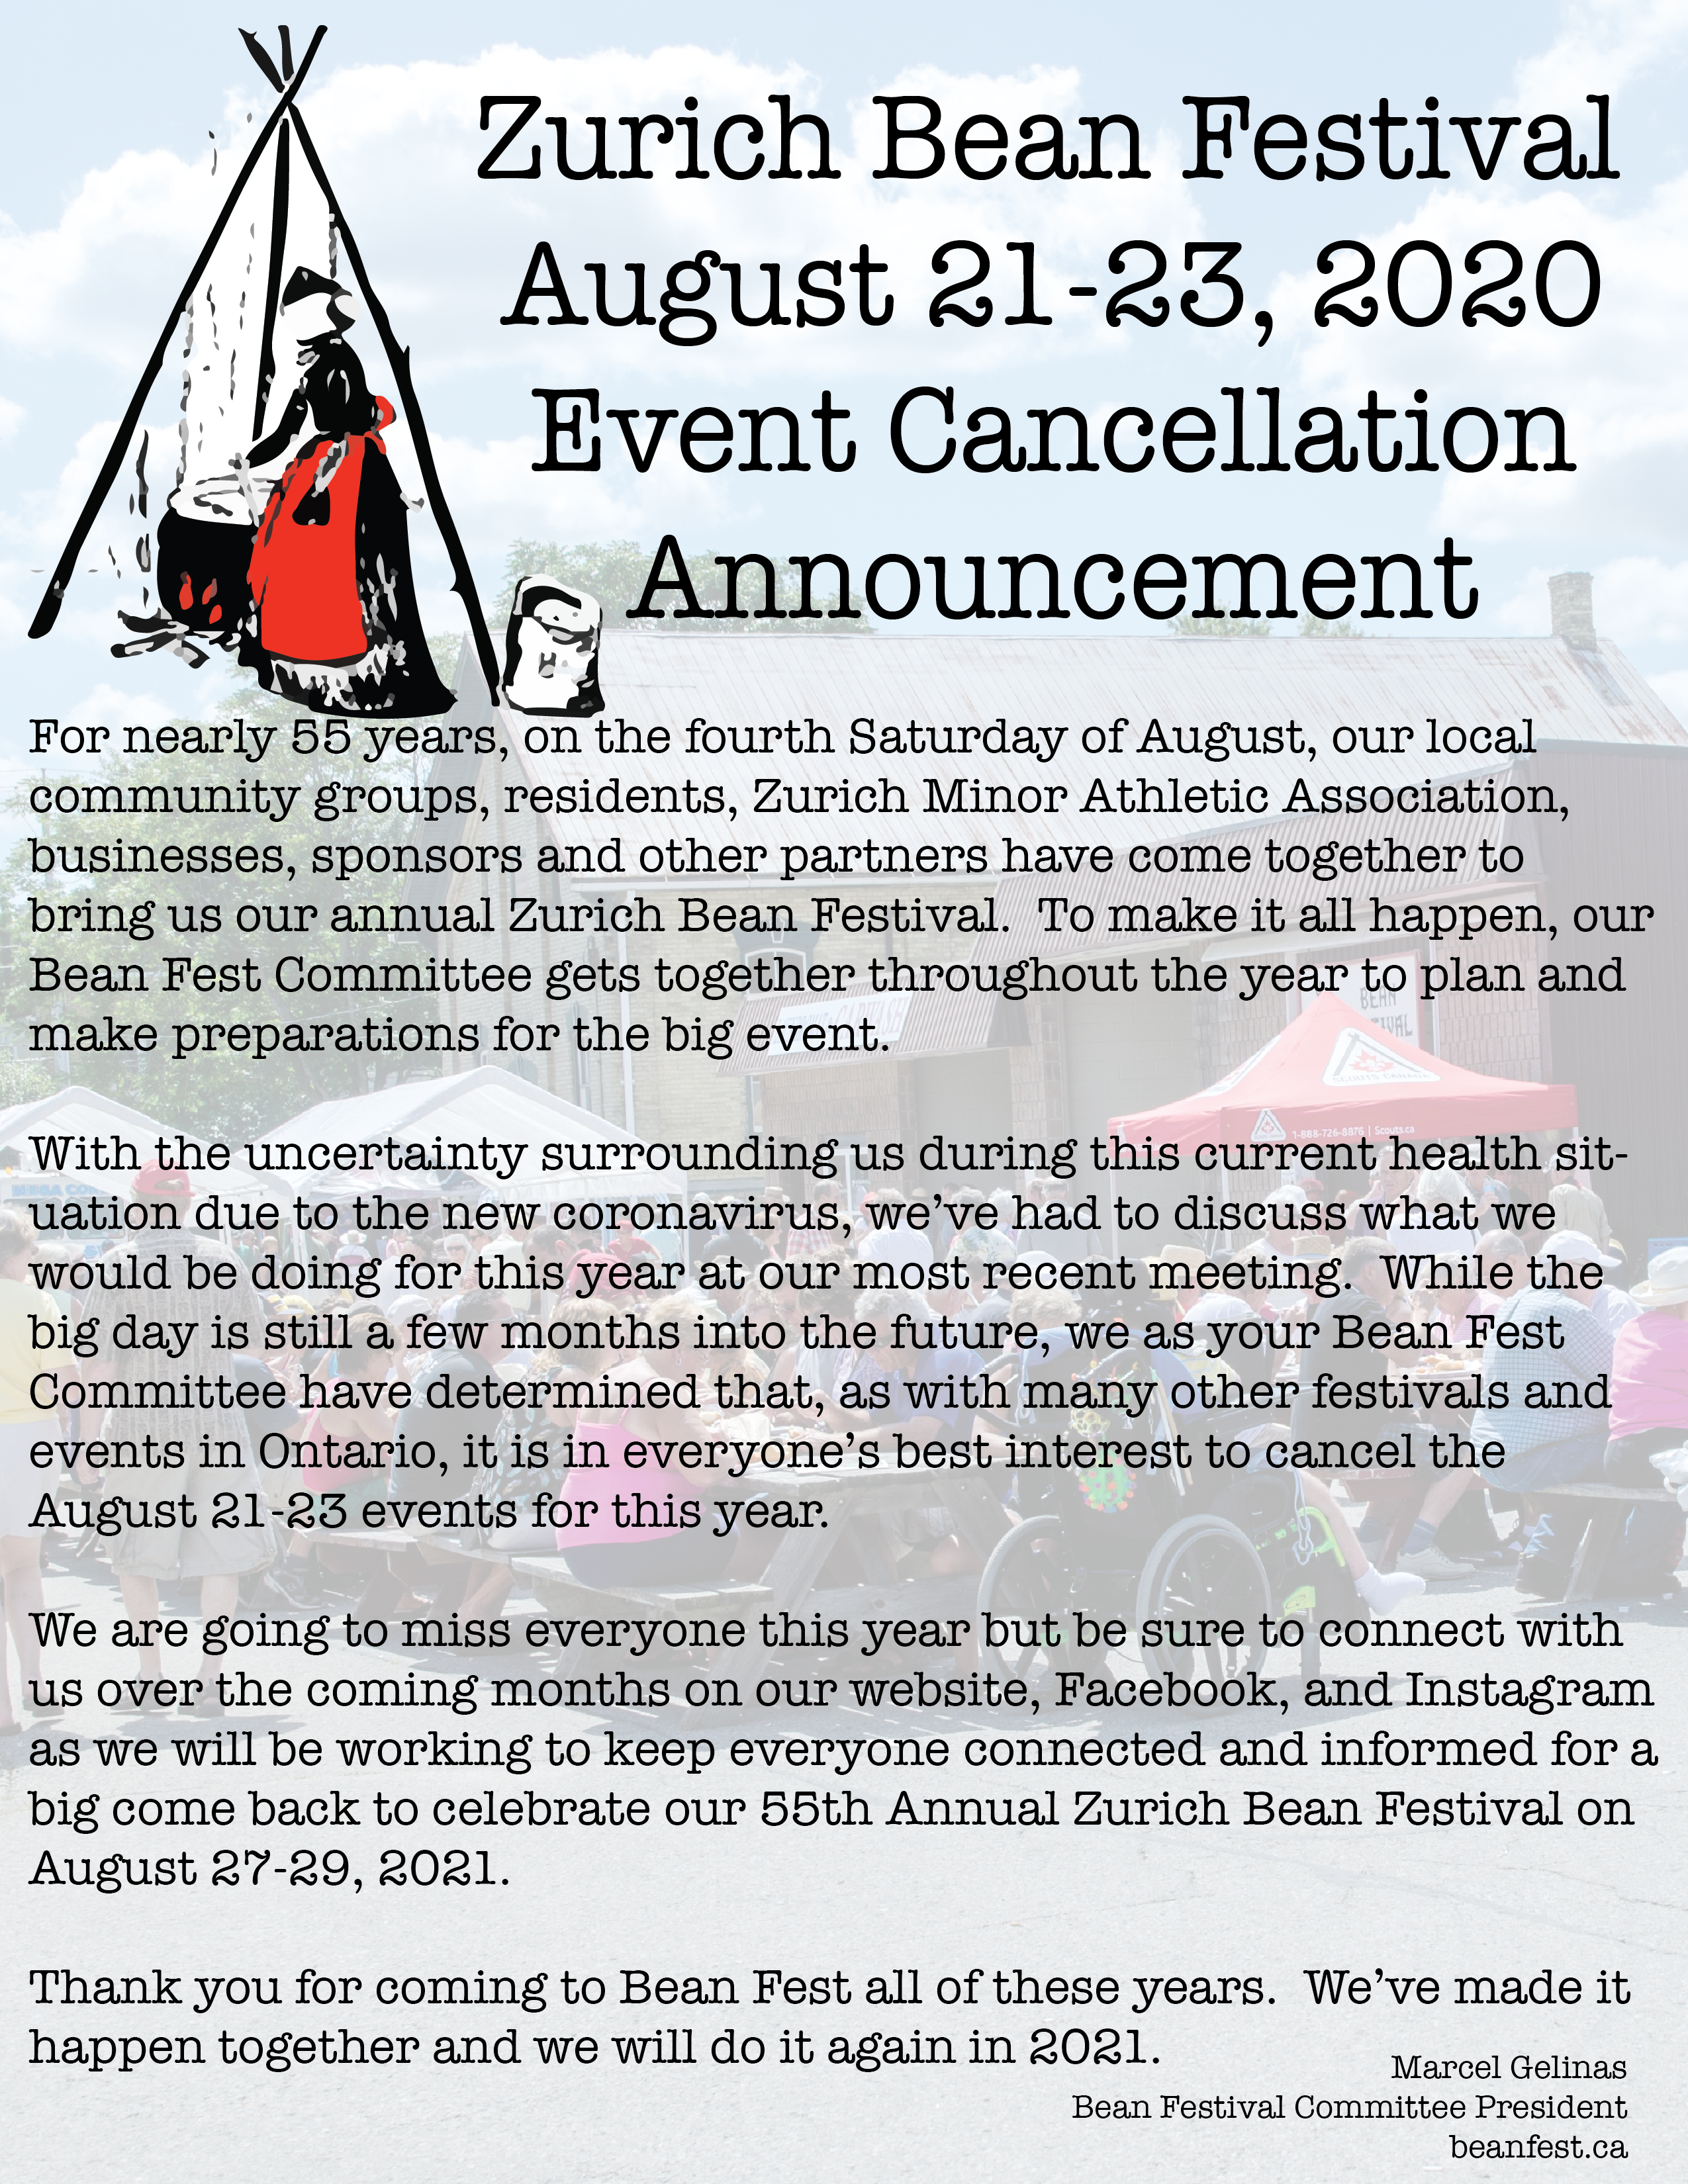 Zurich Bean Festival 2020 - Cancelled